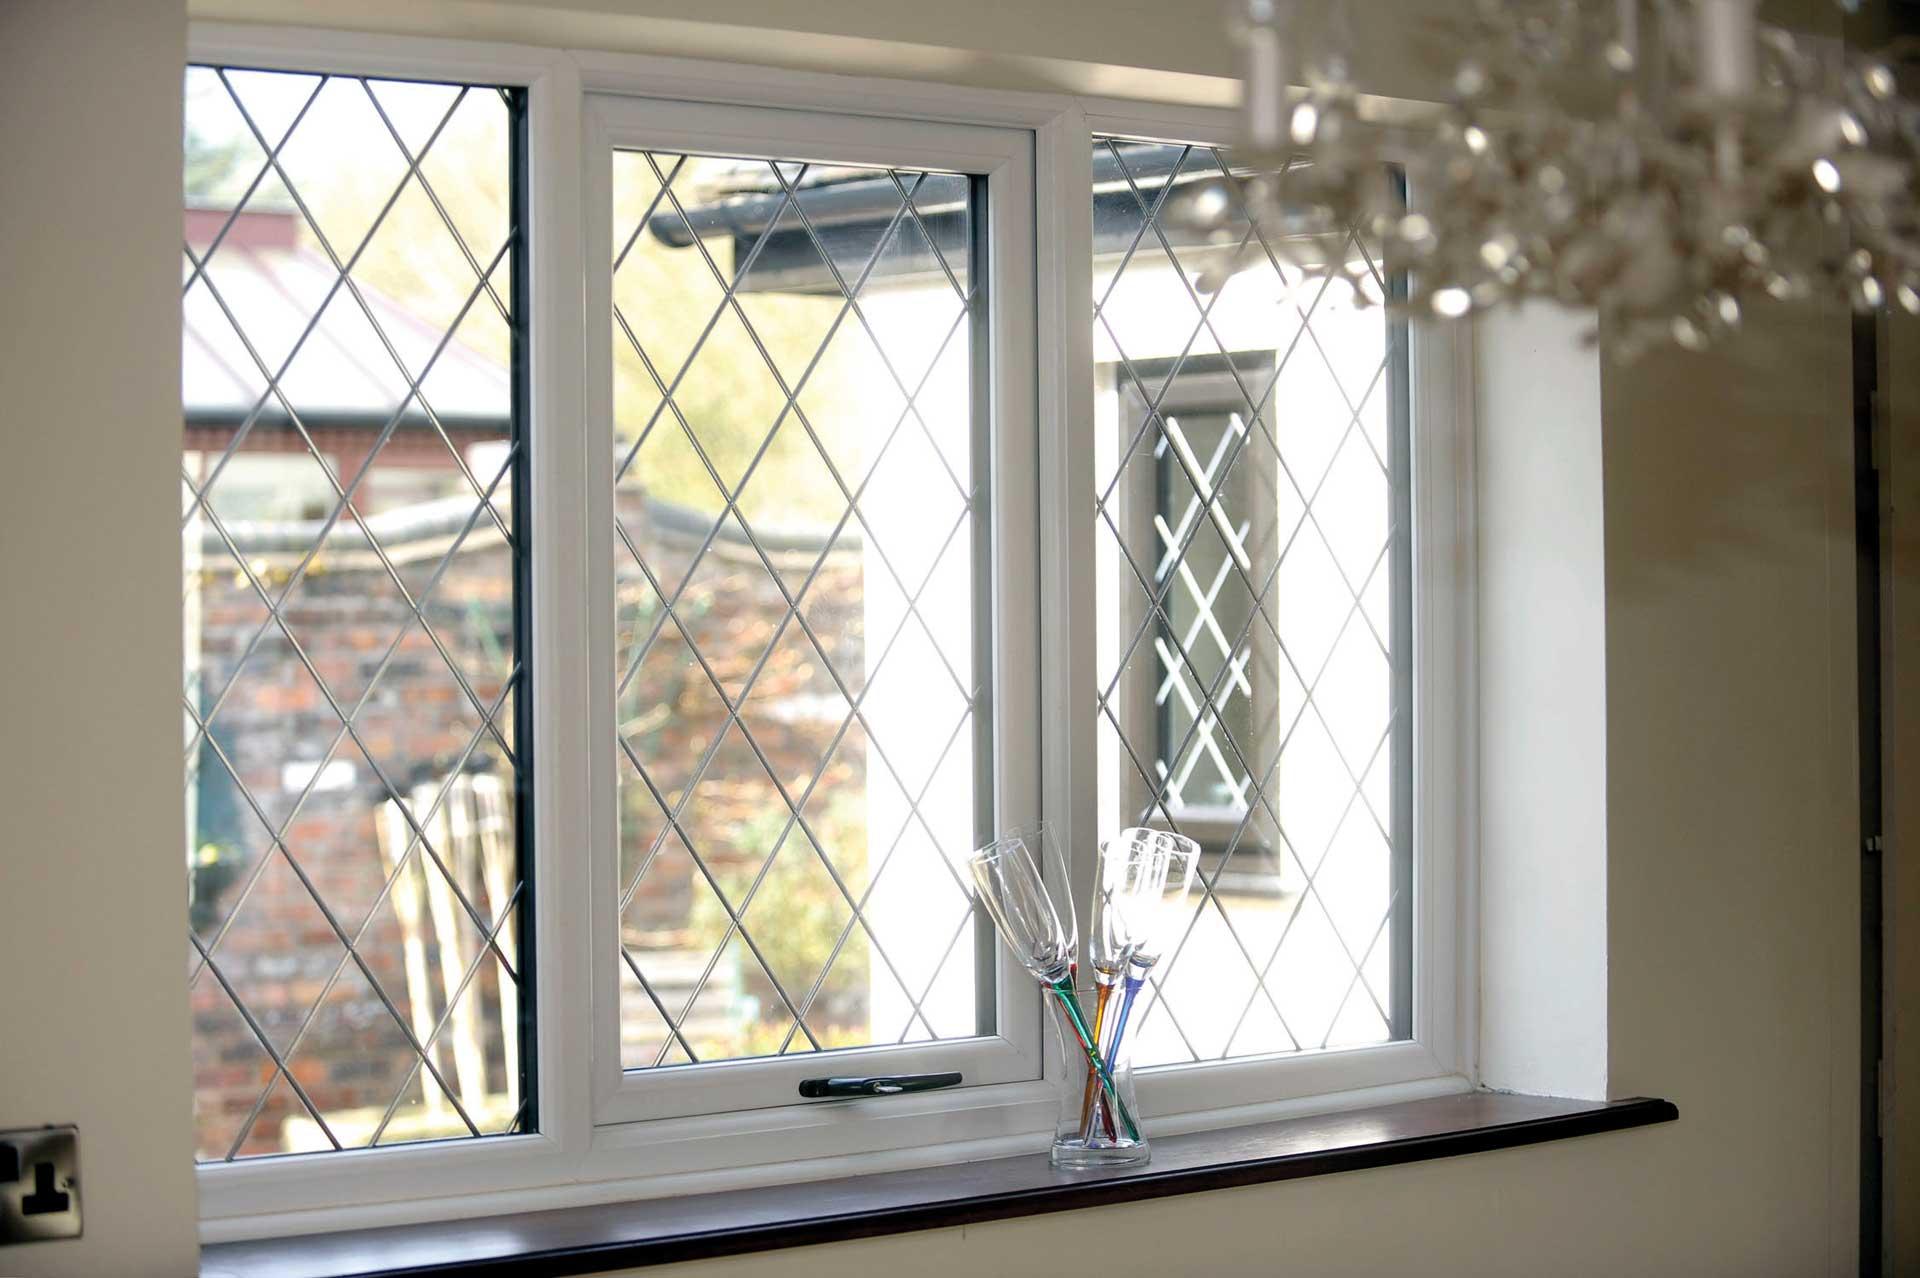 pvc windows royal leamington Spa